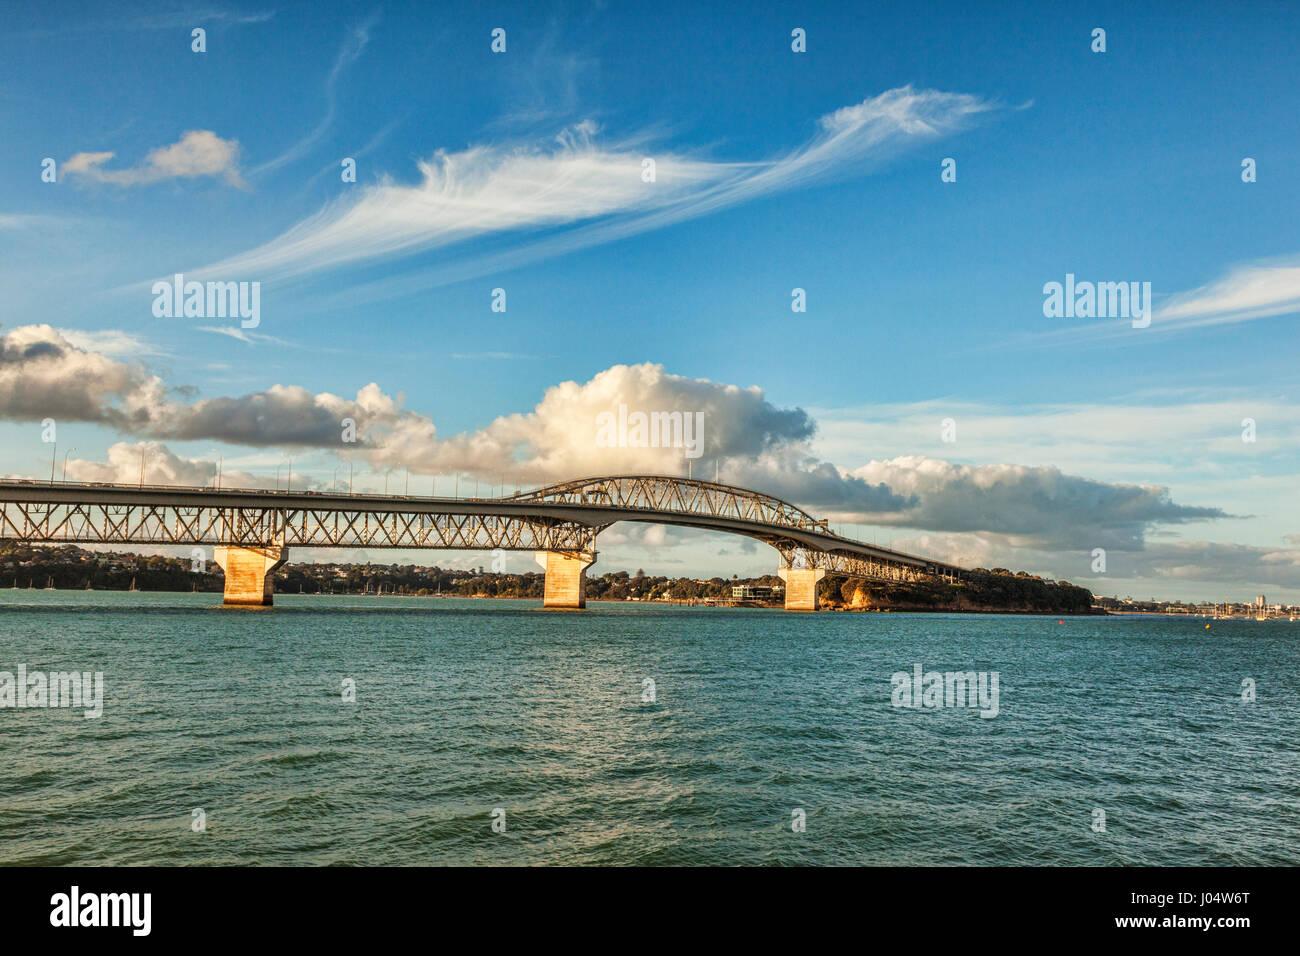 Auckland Harbour Bridge and sunlit clouds. - Stock Image